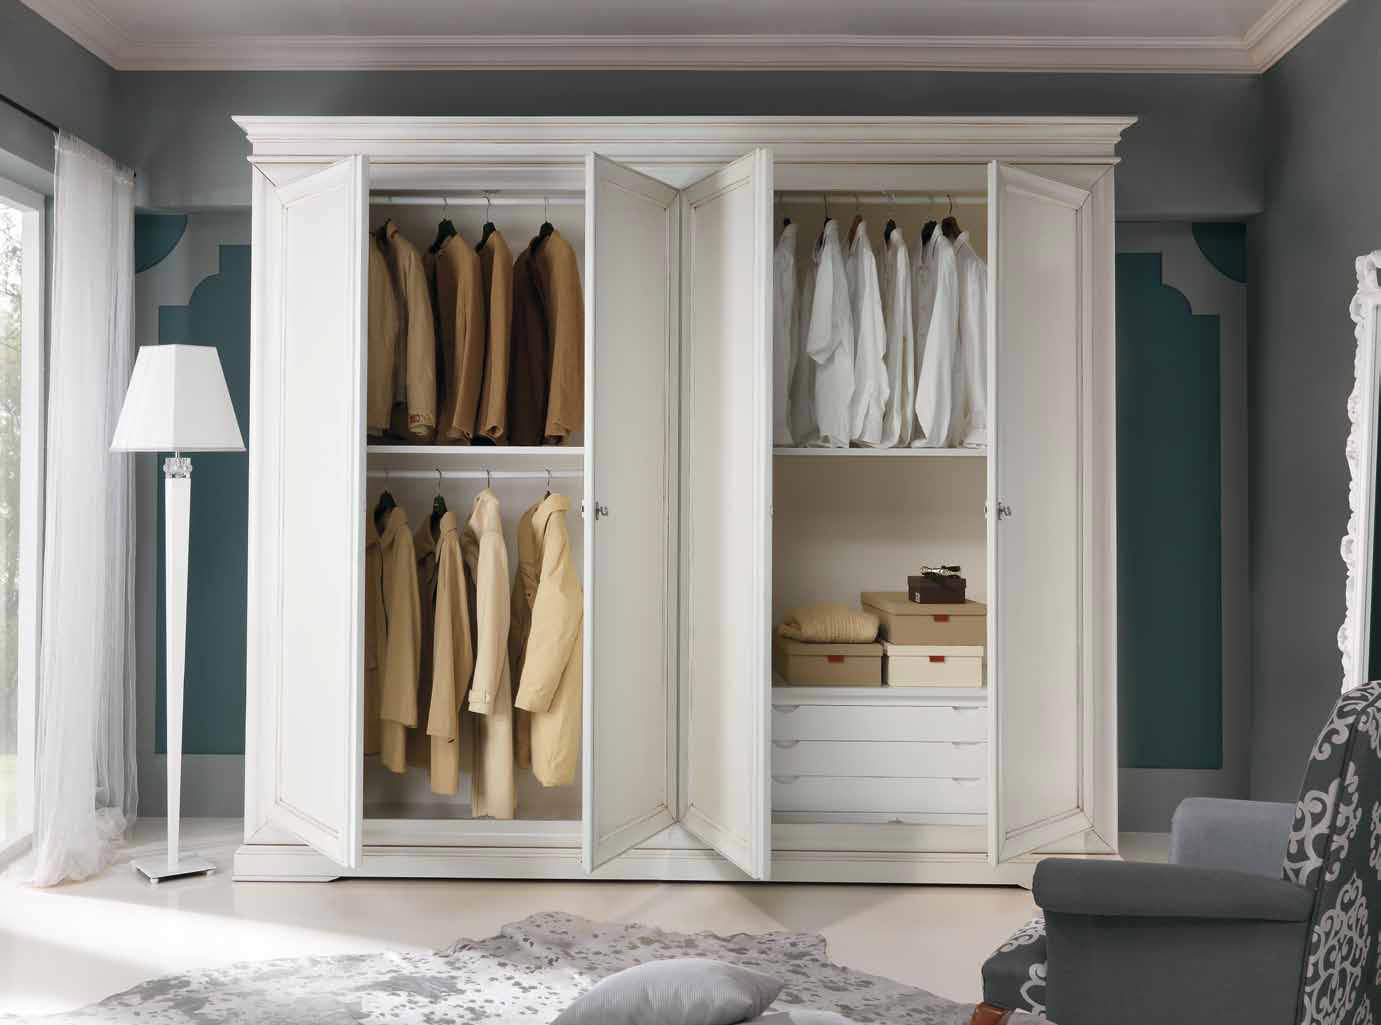 Итальянские шкафы classic 2013 фабрики cp mobili - шкафы и ш.